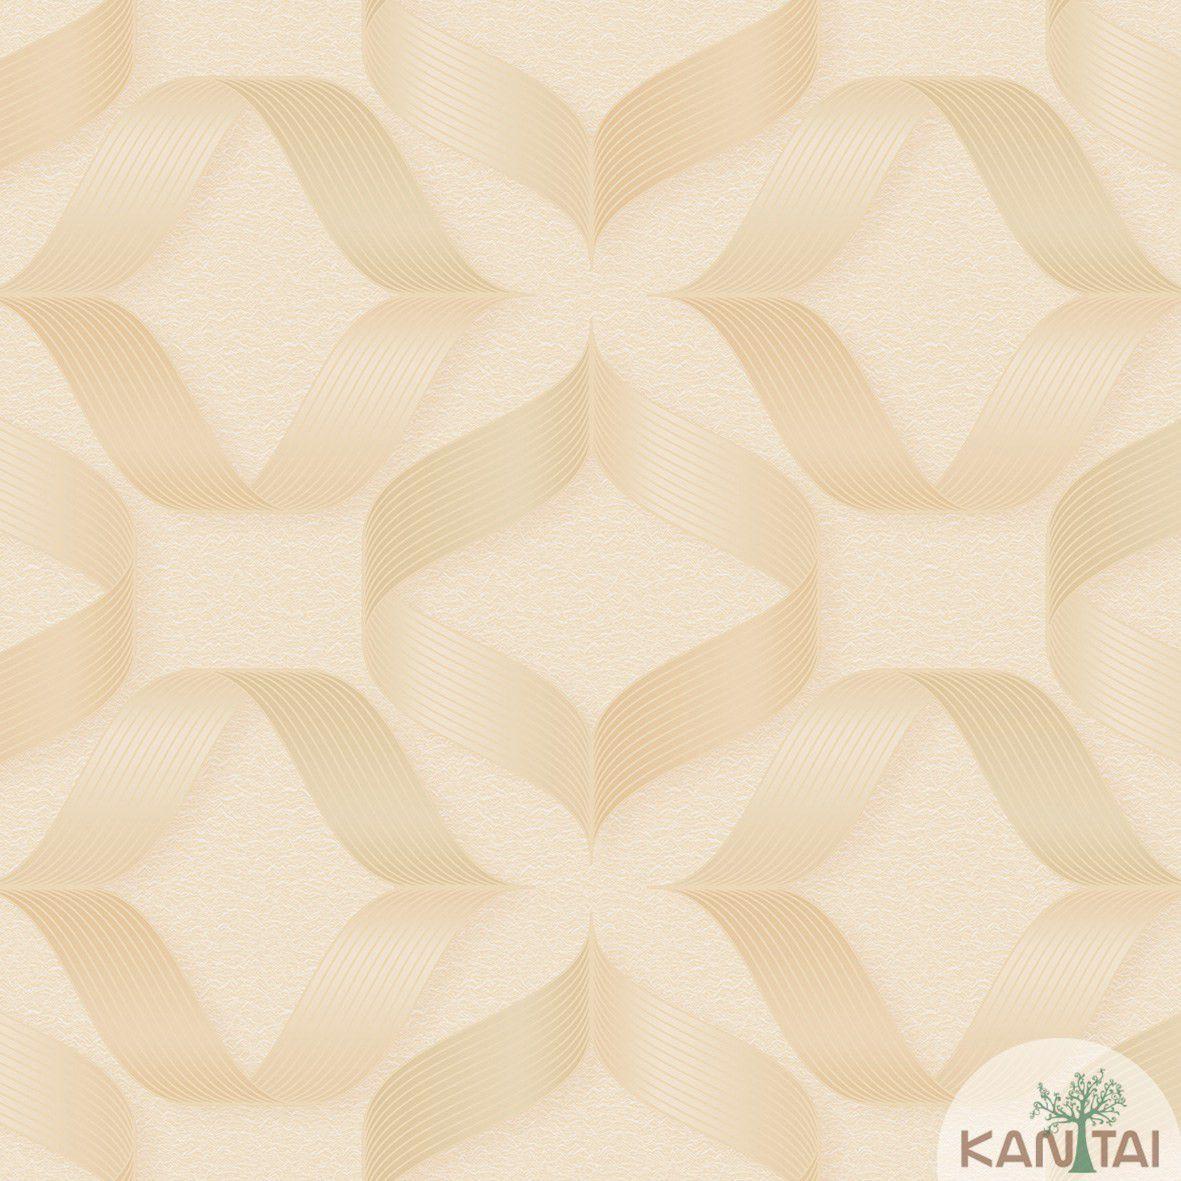 Papel de Parede   Kan Tai  Vinilico Coleção Neonature III 3D Geométrico Formas Bege, Creme